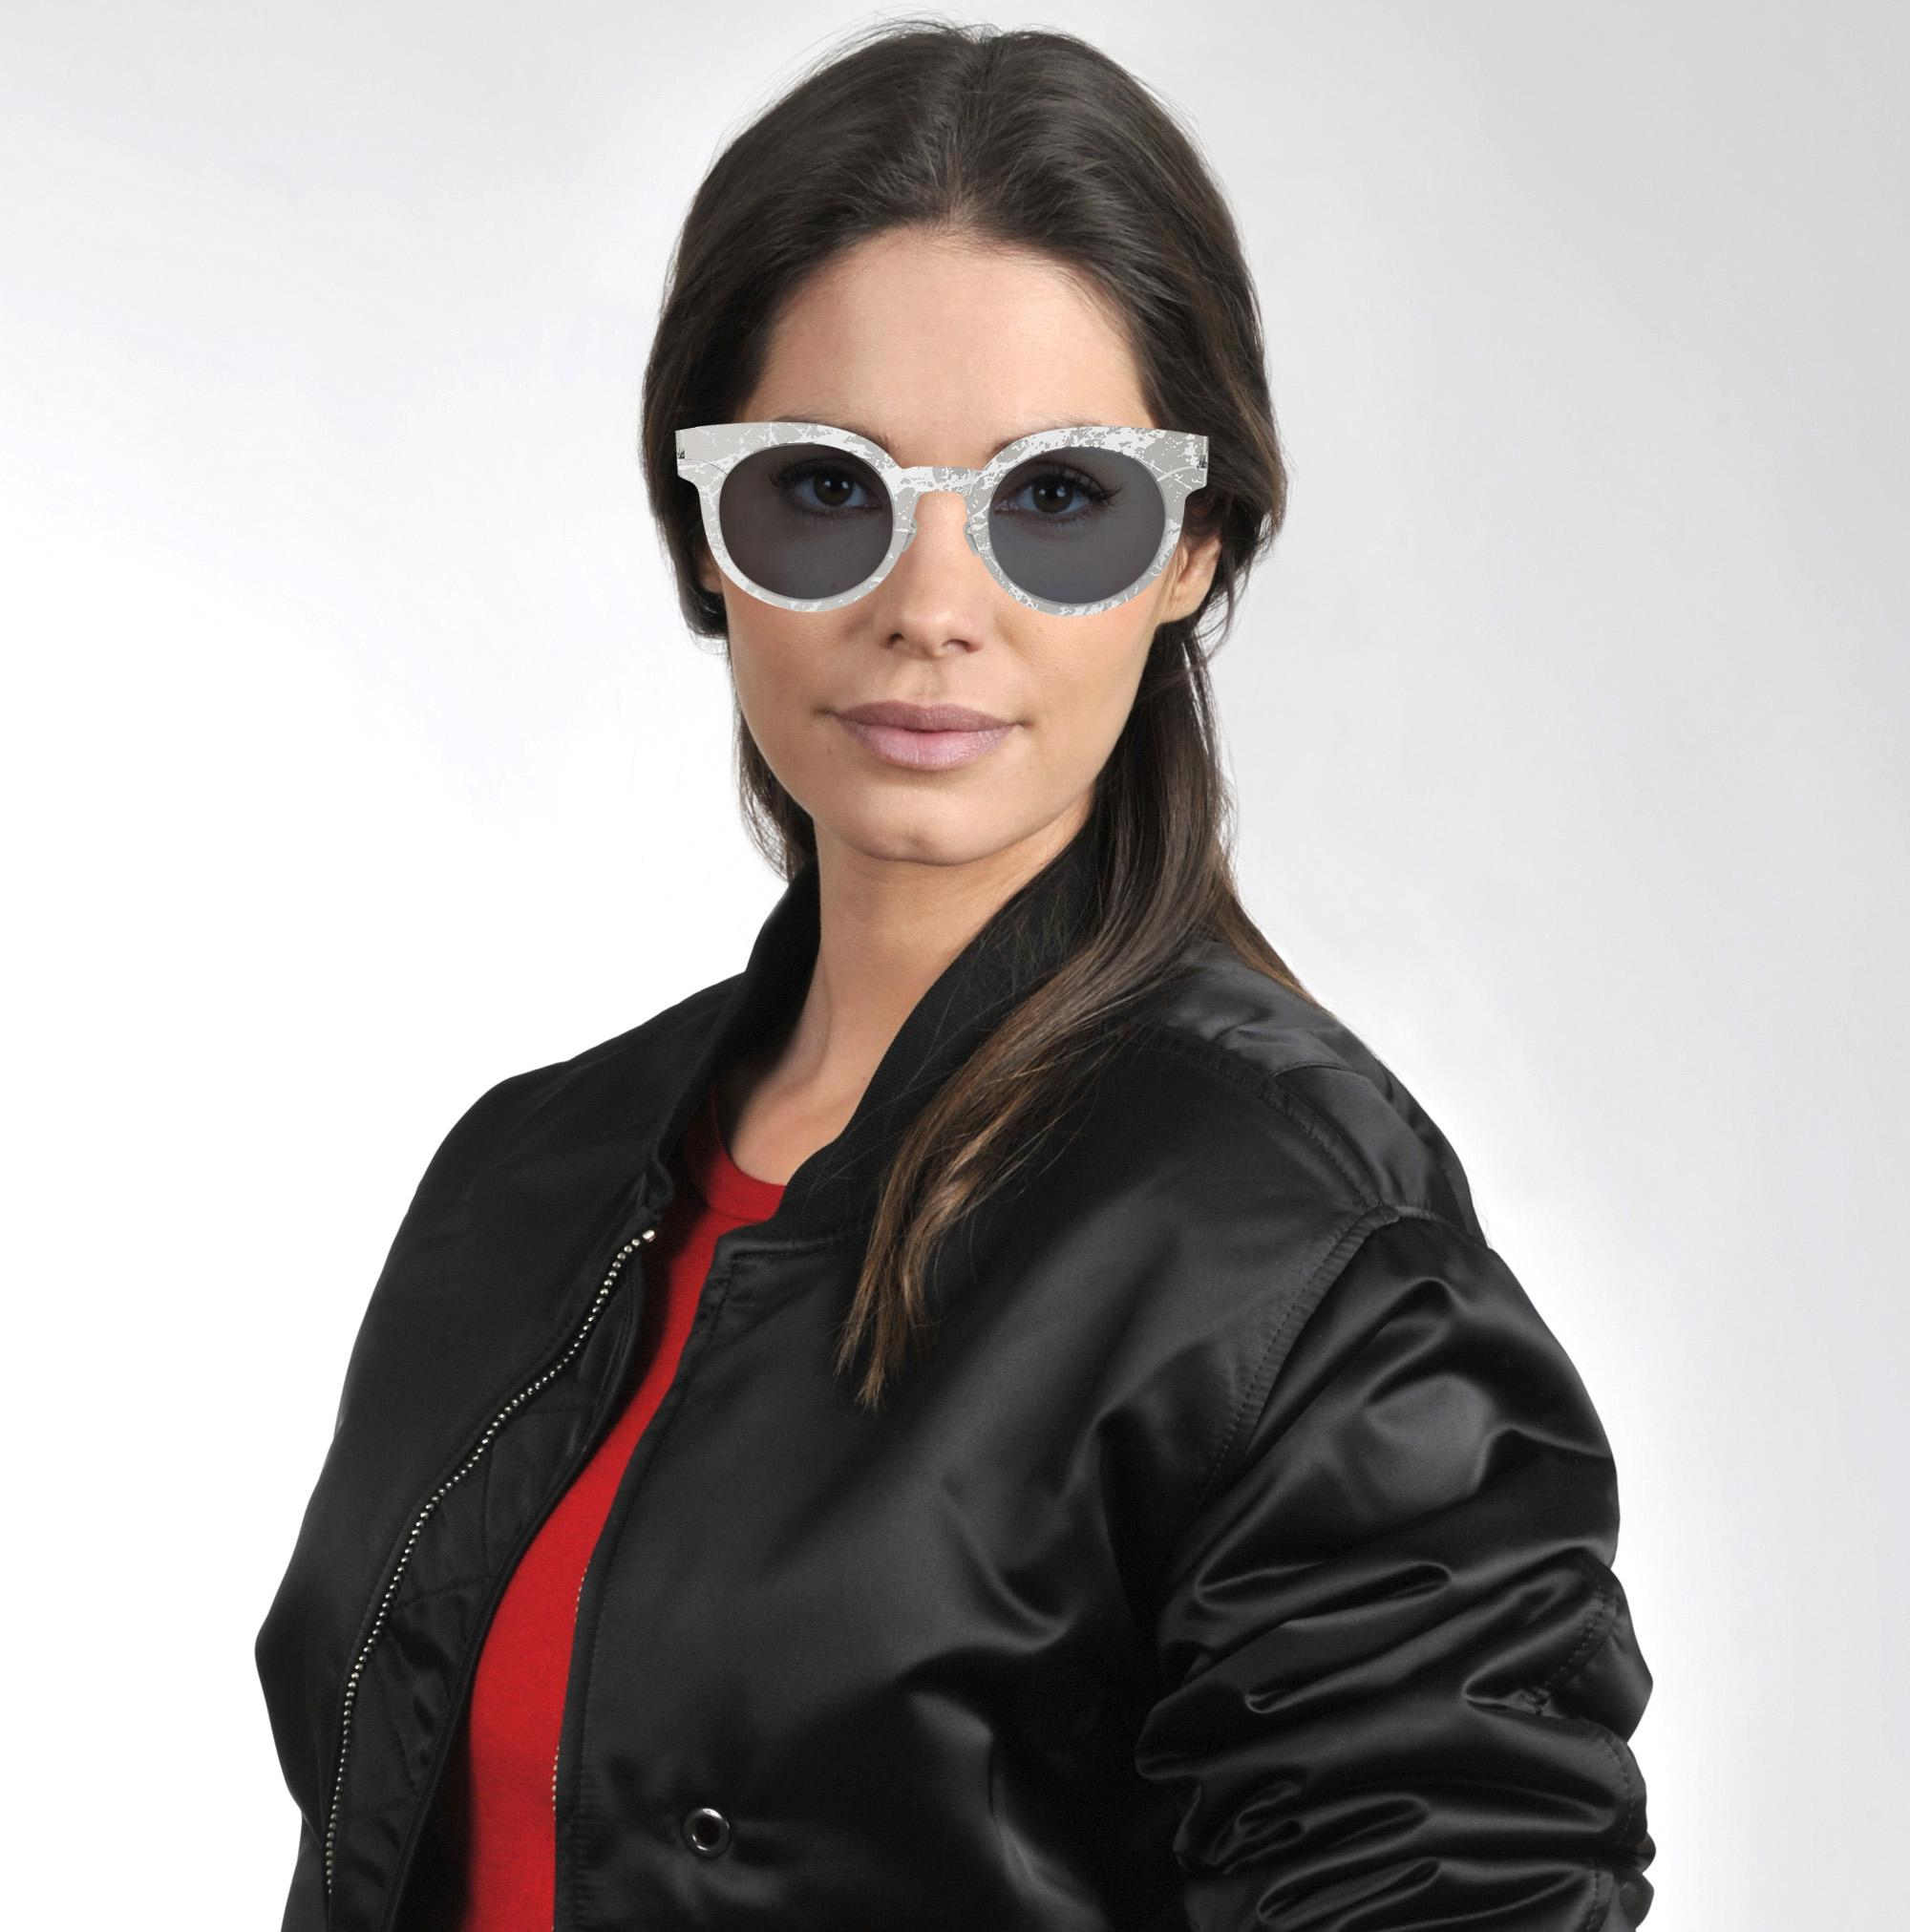 Maison Margiela Mykita & Transfer 001 Sunglasses in Grey (Grey)